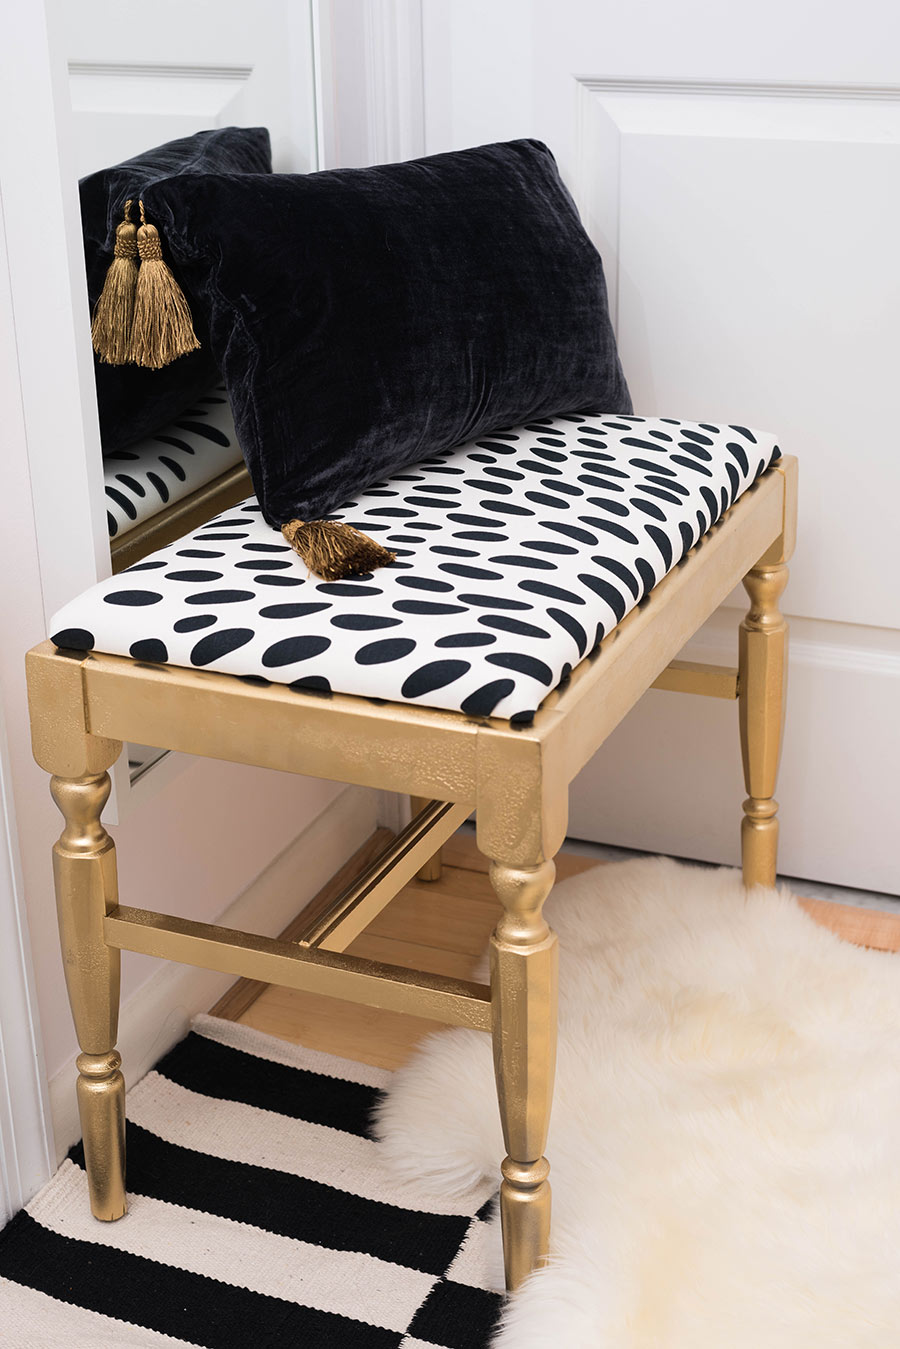 Bench - DIY w/IKEA fabric